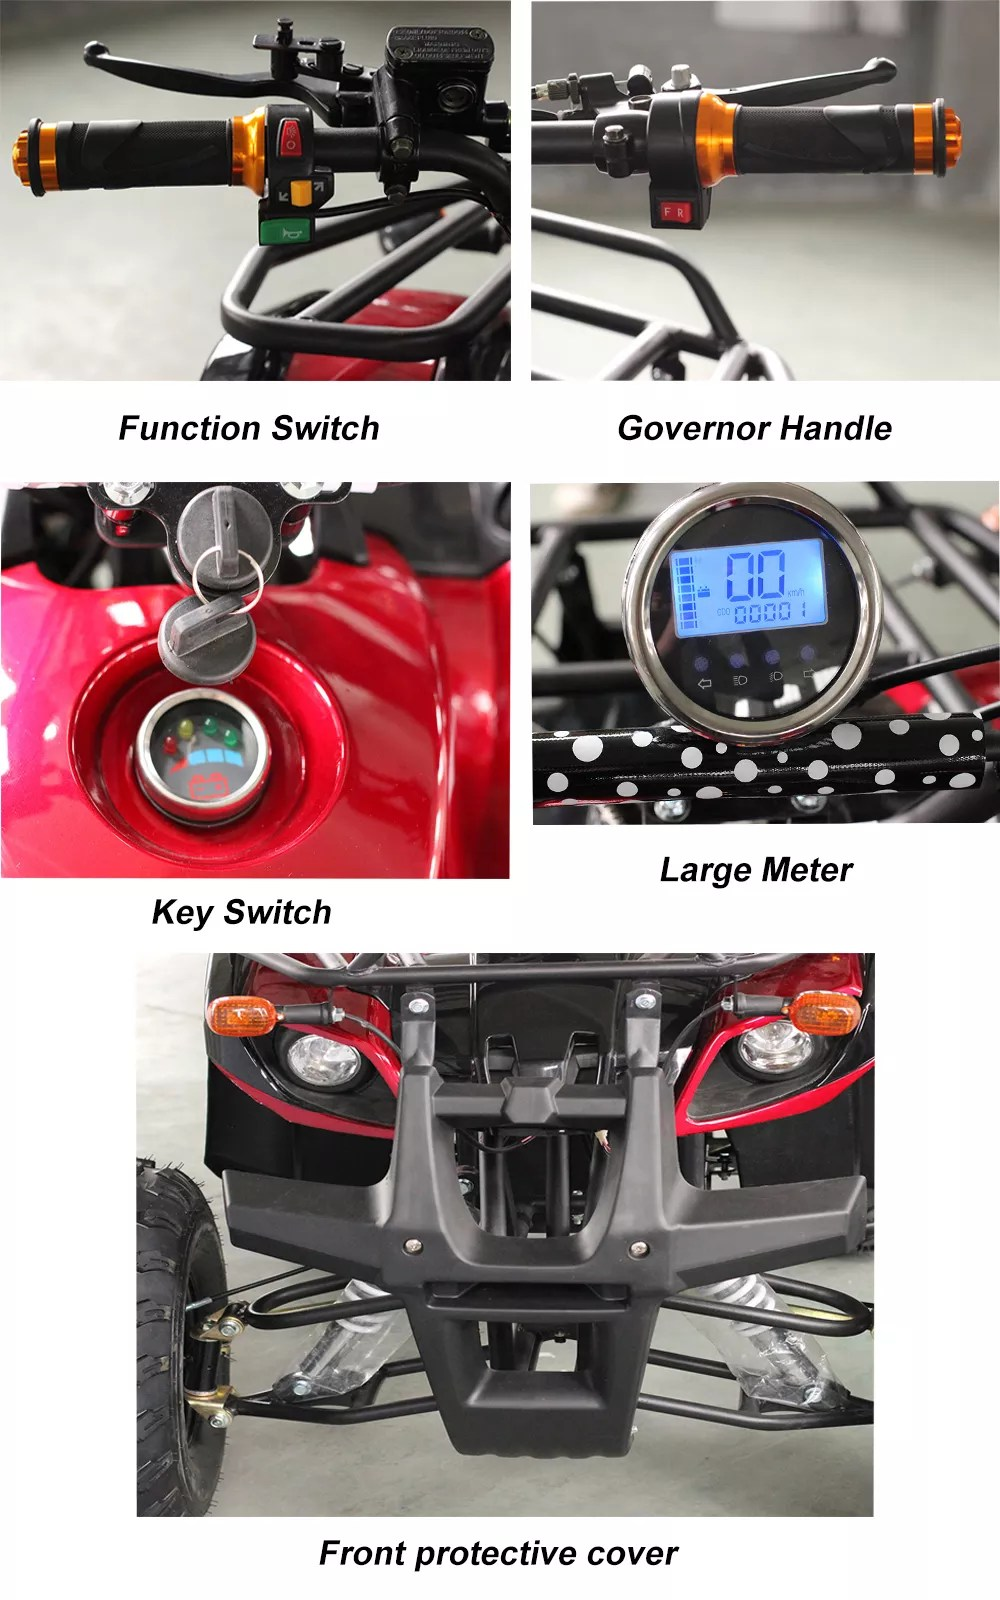 Adult Electric Quad Bike : adult, electric, Newest, 3000w, Adult, Electric, Legal, Bikes, 4x4,Quad, Bikes,Newest, Product, Alibaba.com